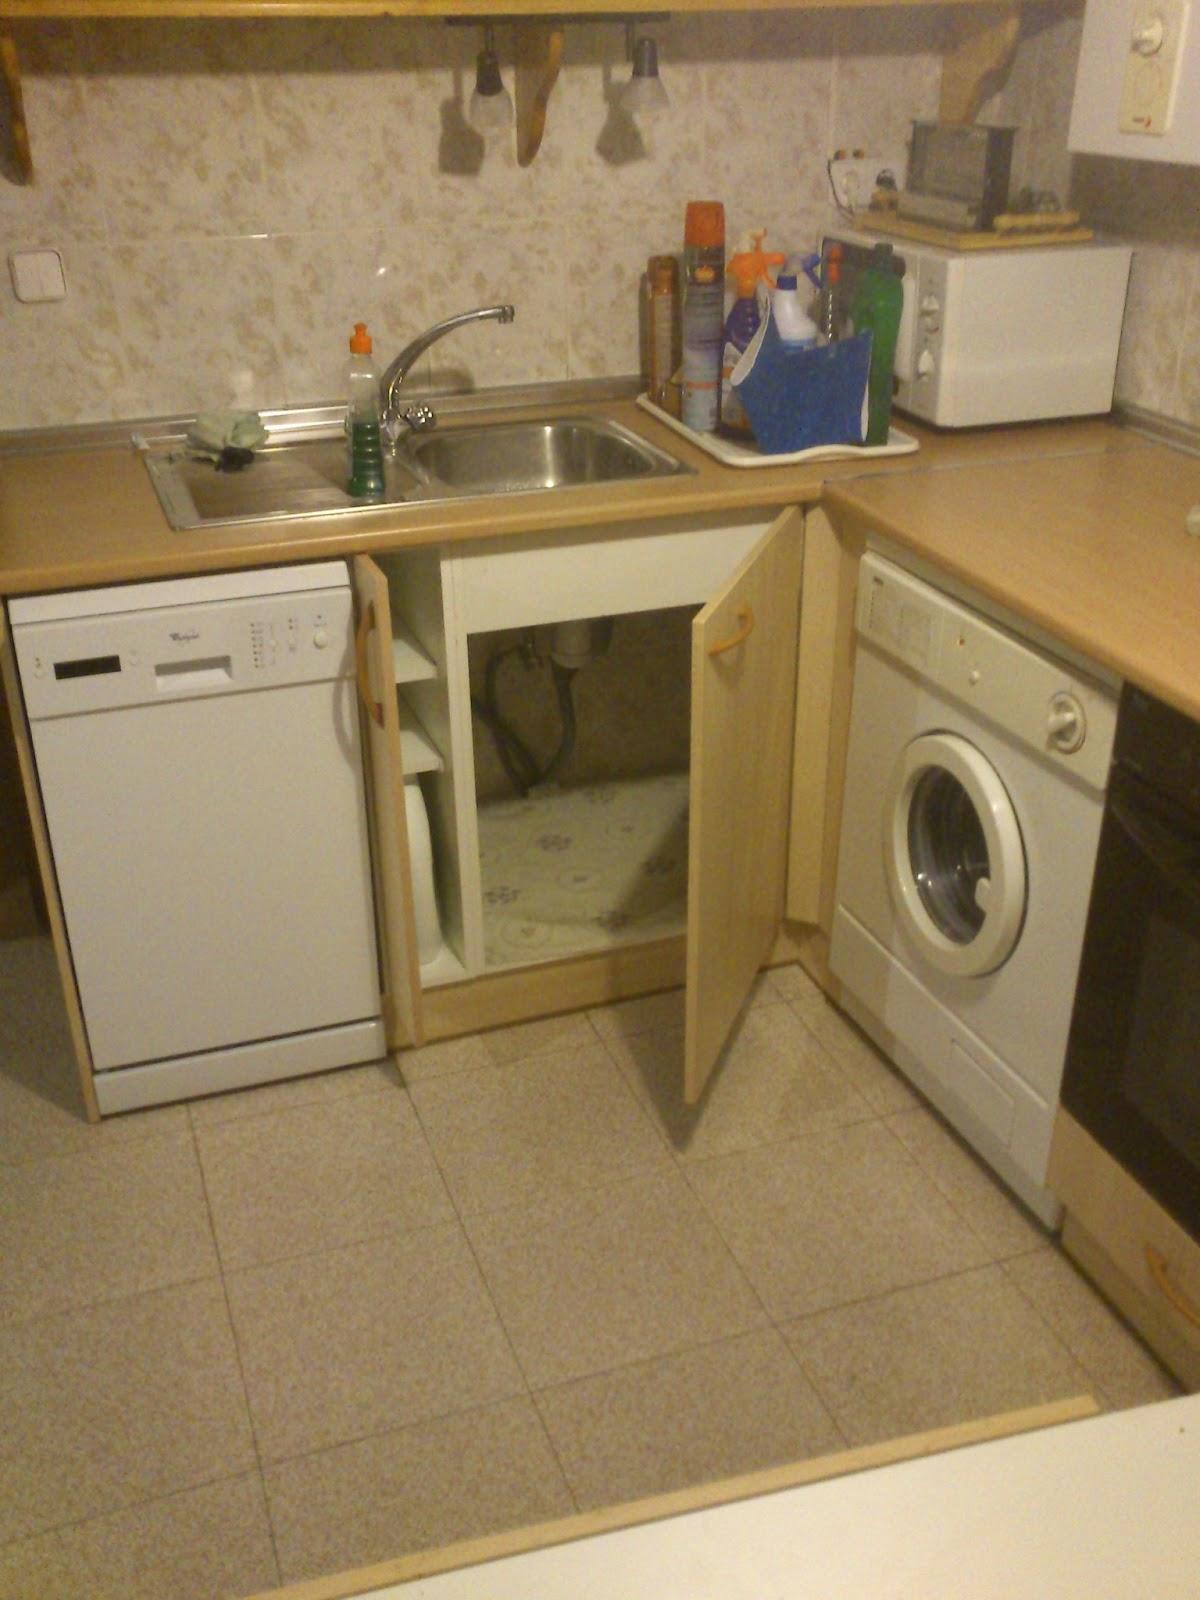 Sergio vivas carpintero peque as reformas en cocina - Electrodomesticos para cocinas pequenas ...